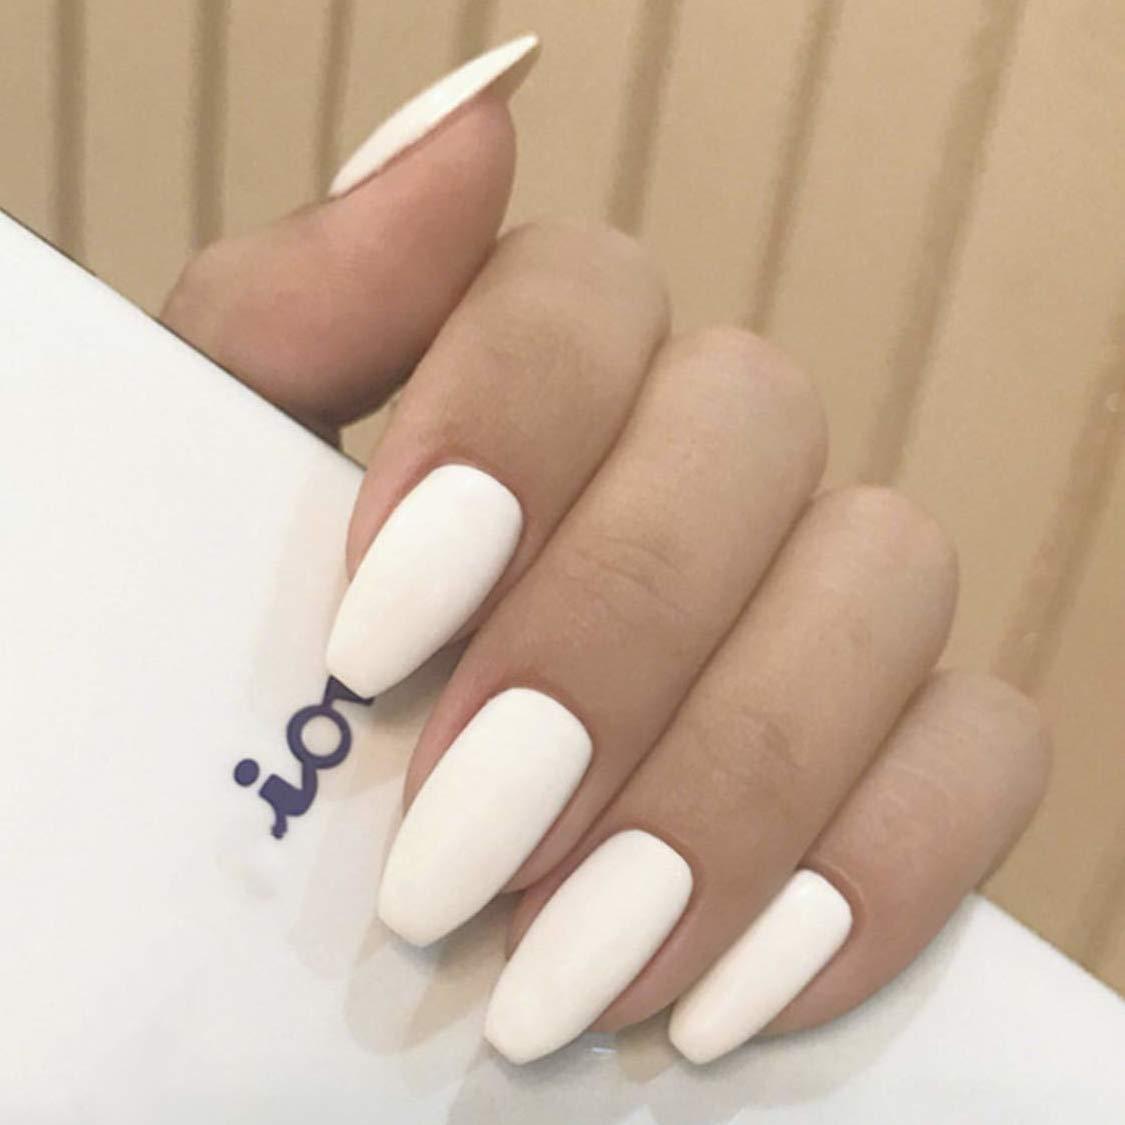 24 Pcs Fake Nails Matte Coffin Nails White Full Cover Ballerina Nail Art Medium False Gel Nails Tips Sets for Women Teens Girls (White)